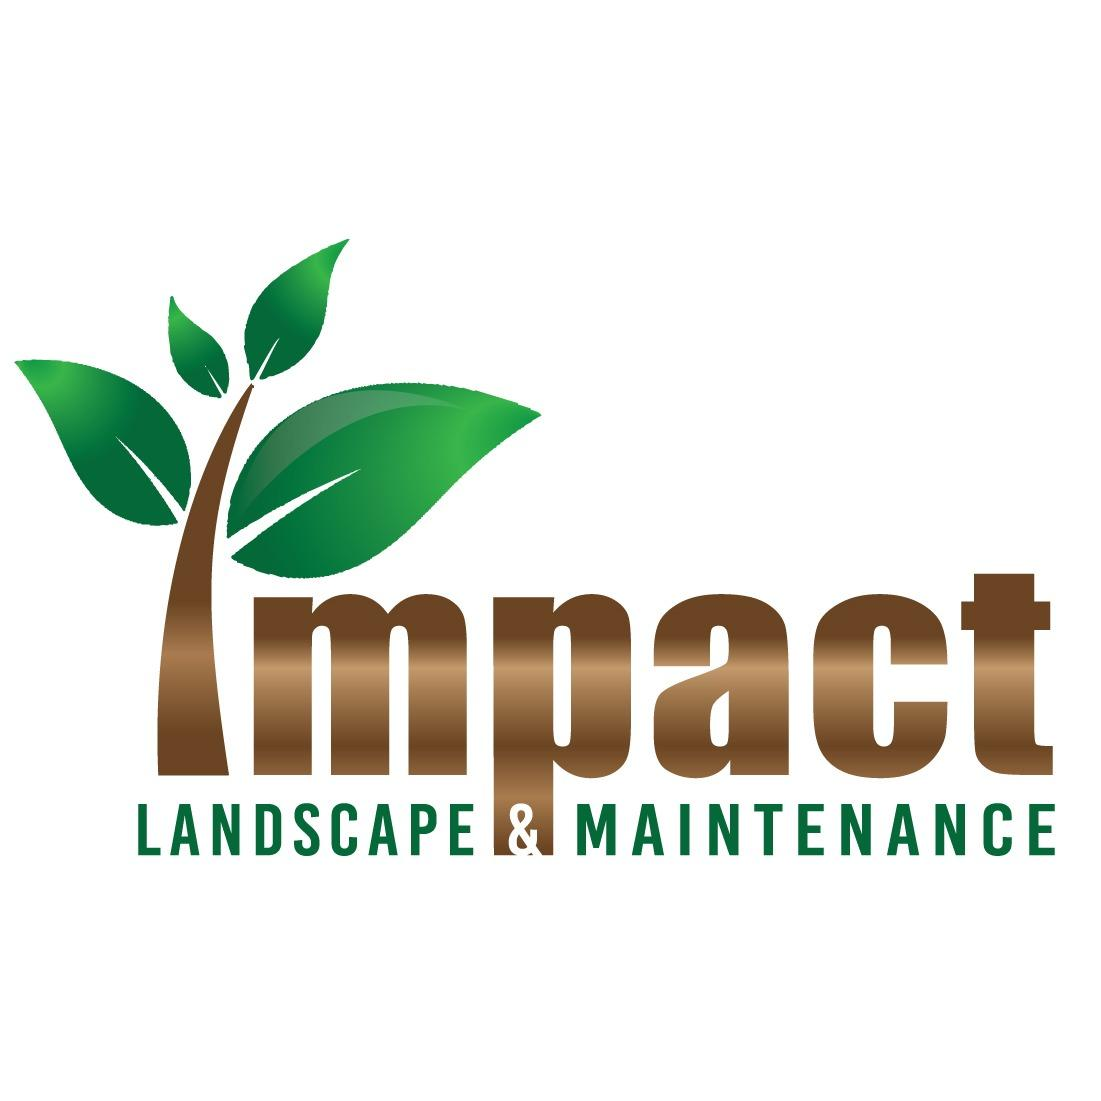 Impact Landscape & Maintenance image 11